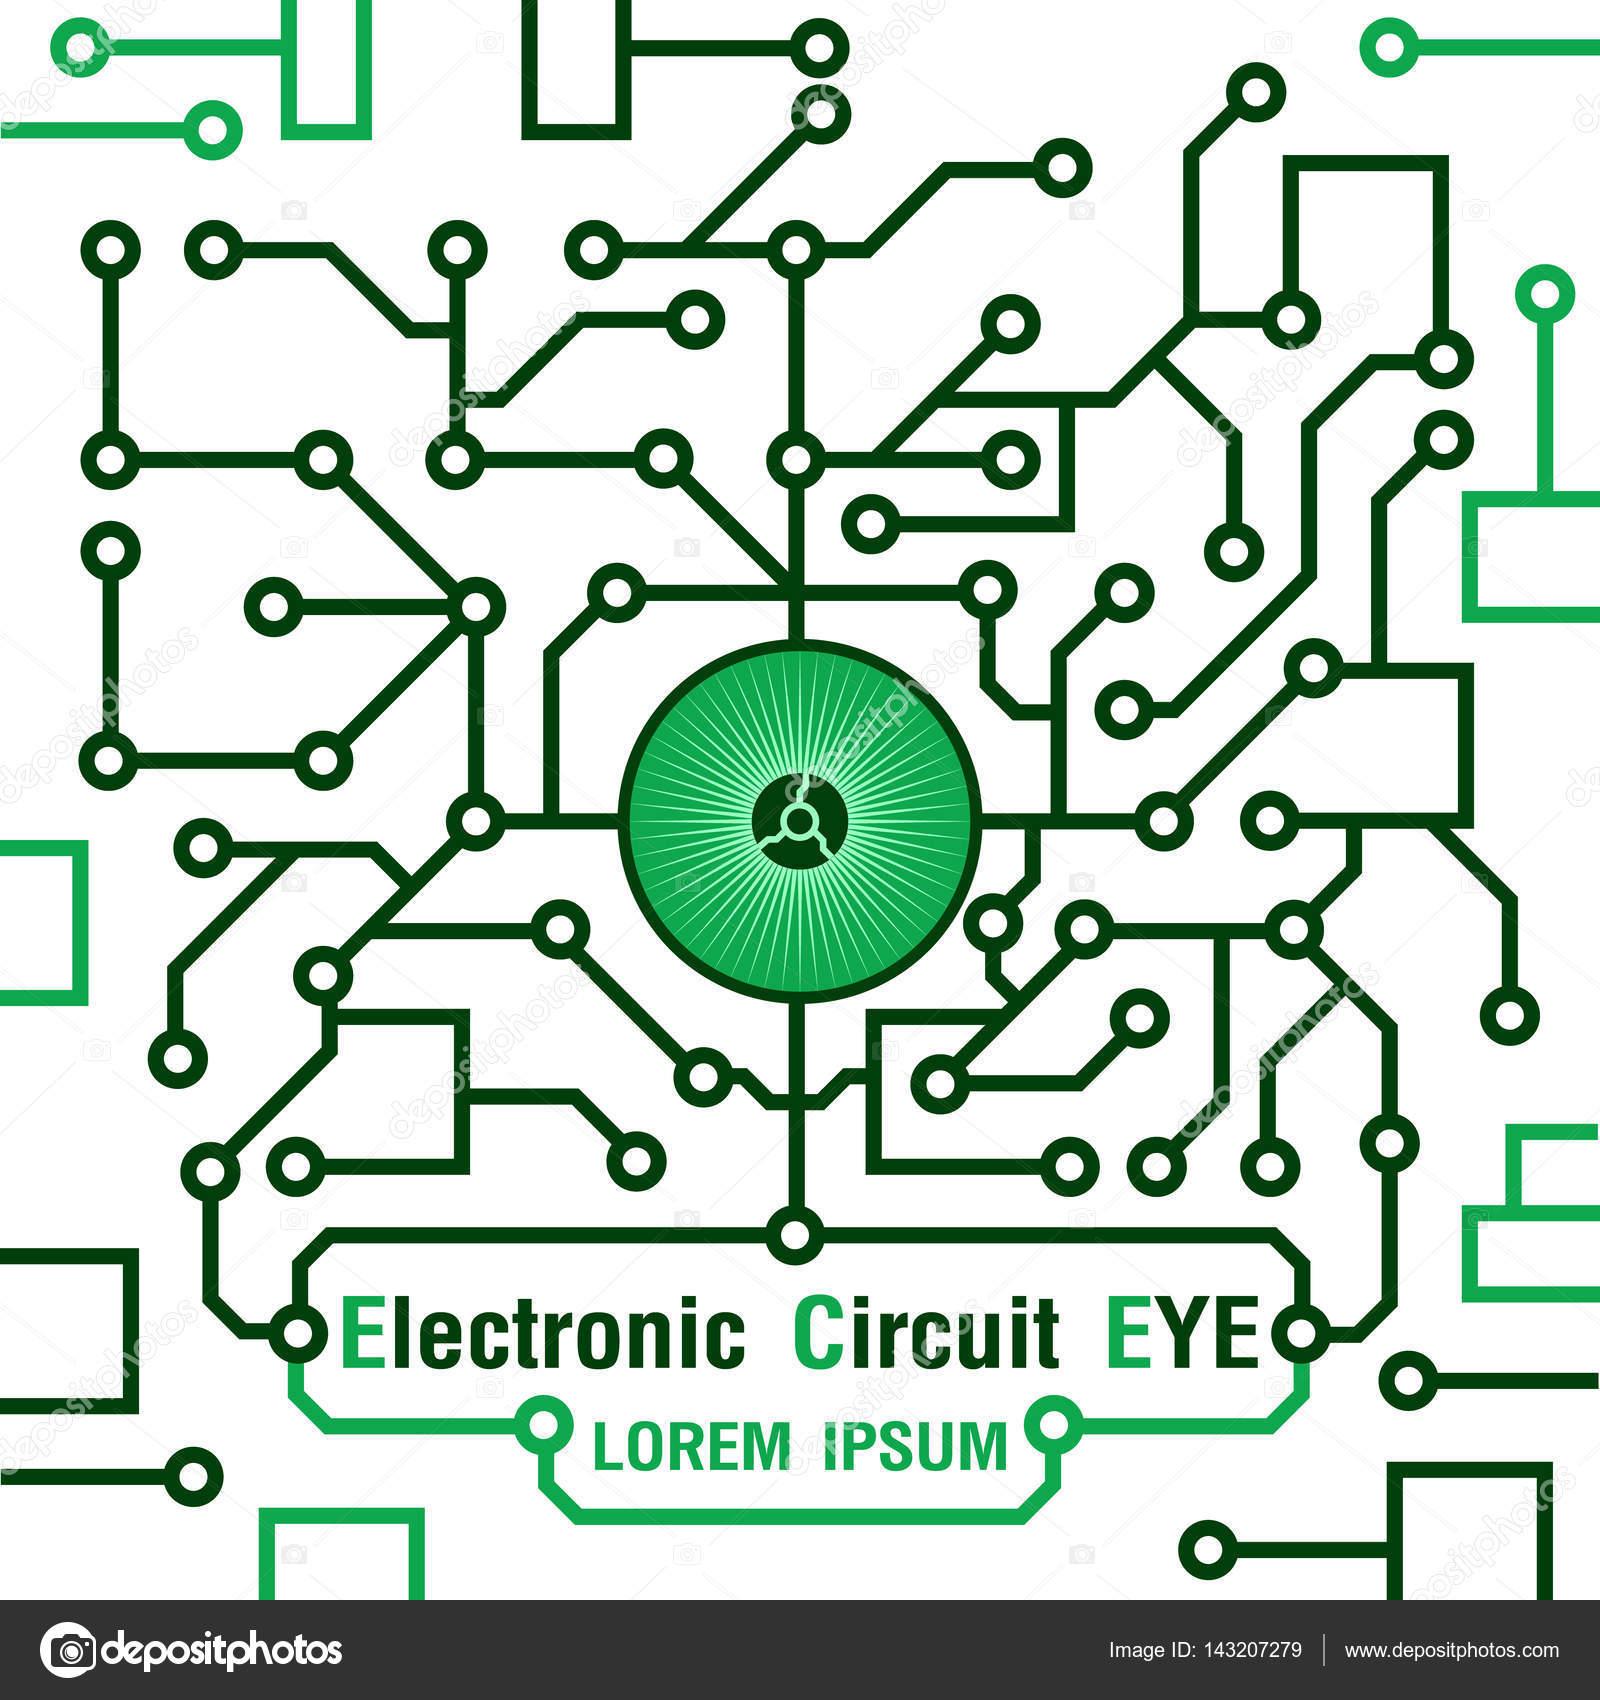 Elektronische Schaltung Symbol Augensymbol. Vektor-illustration ...